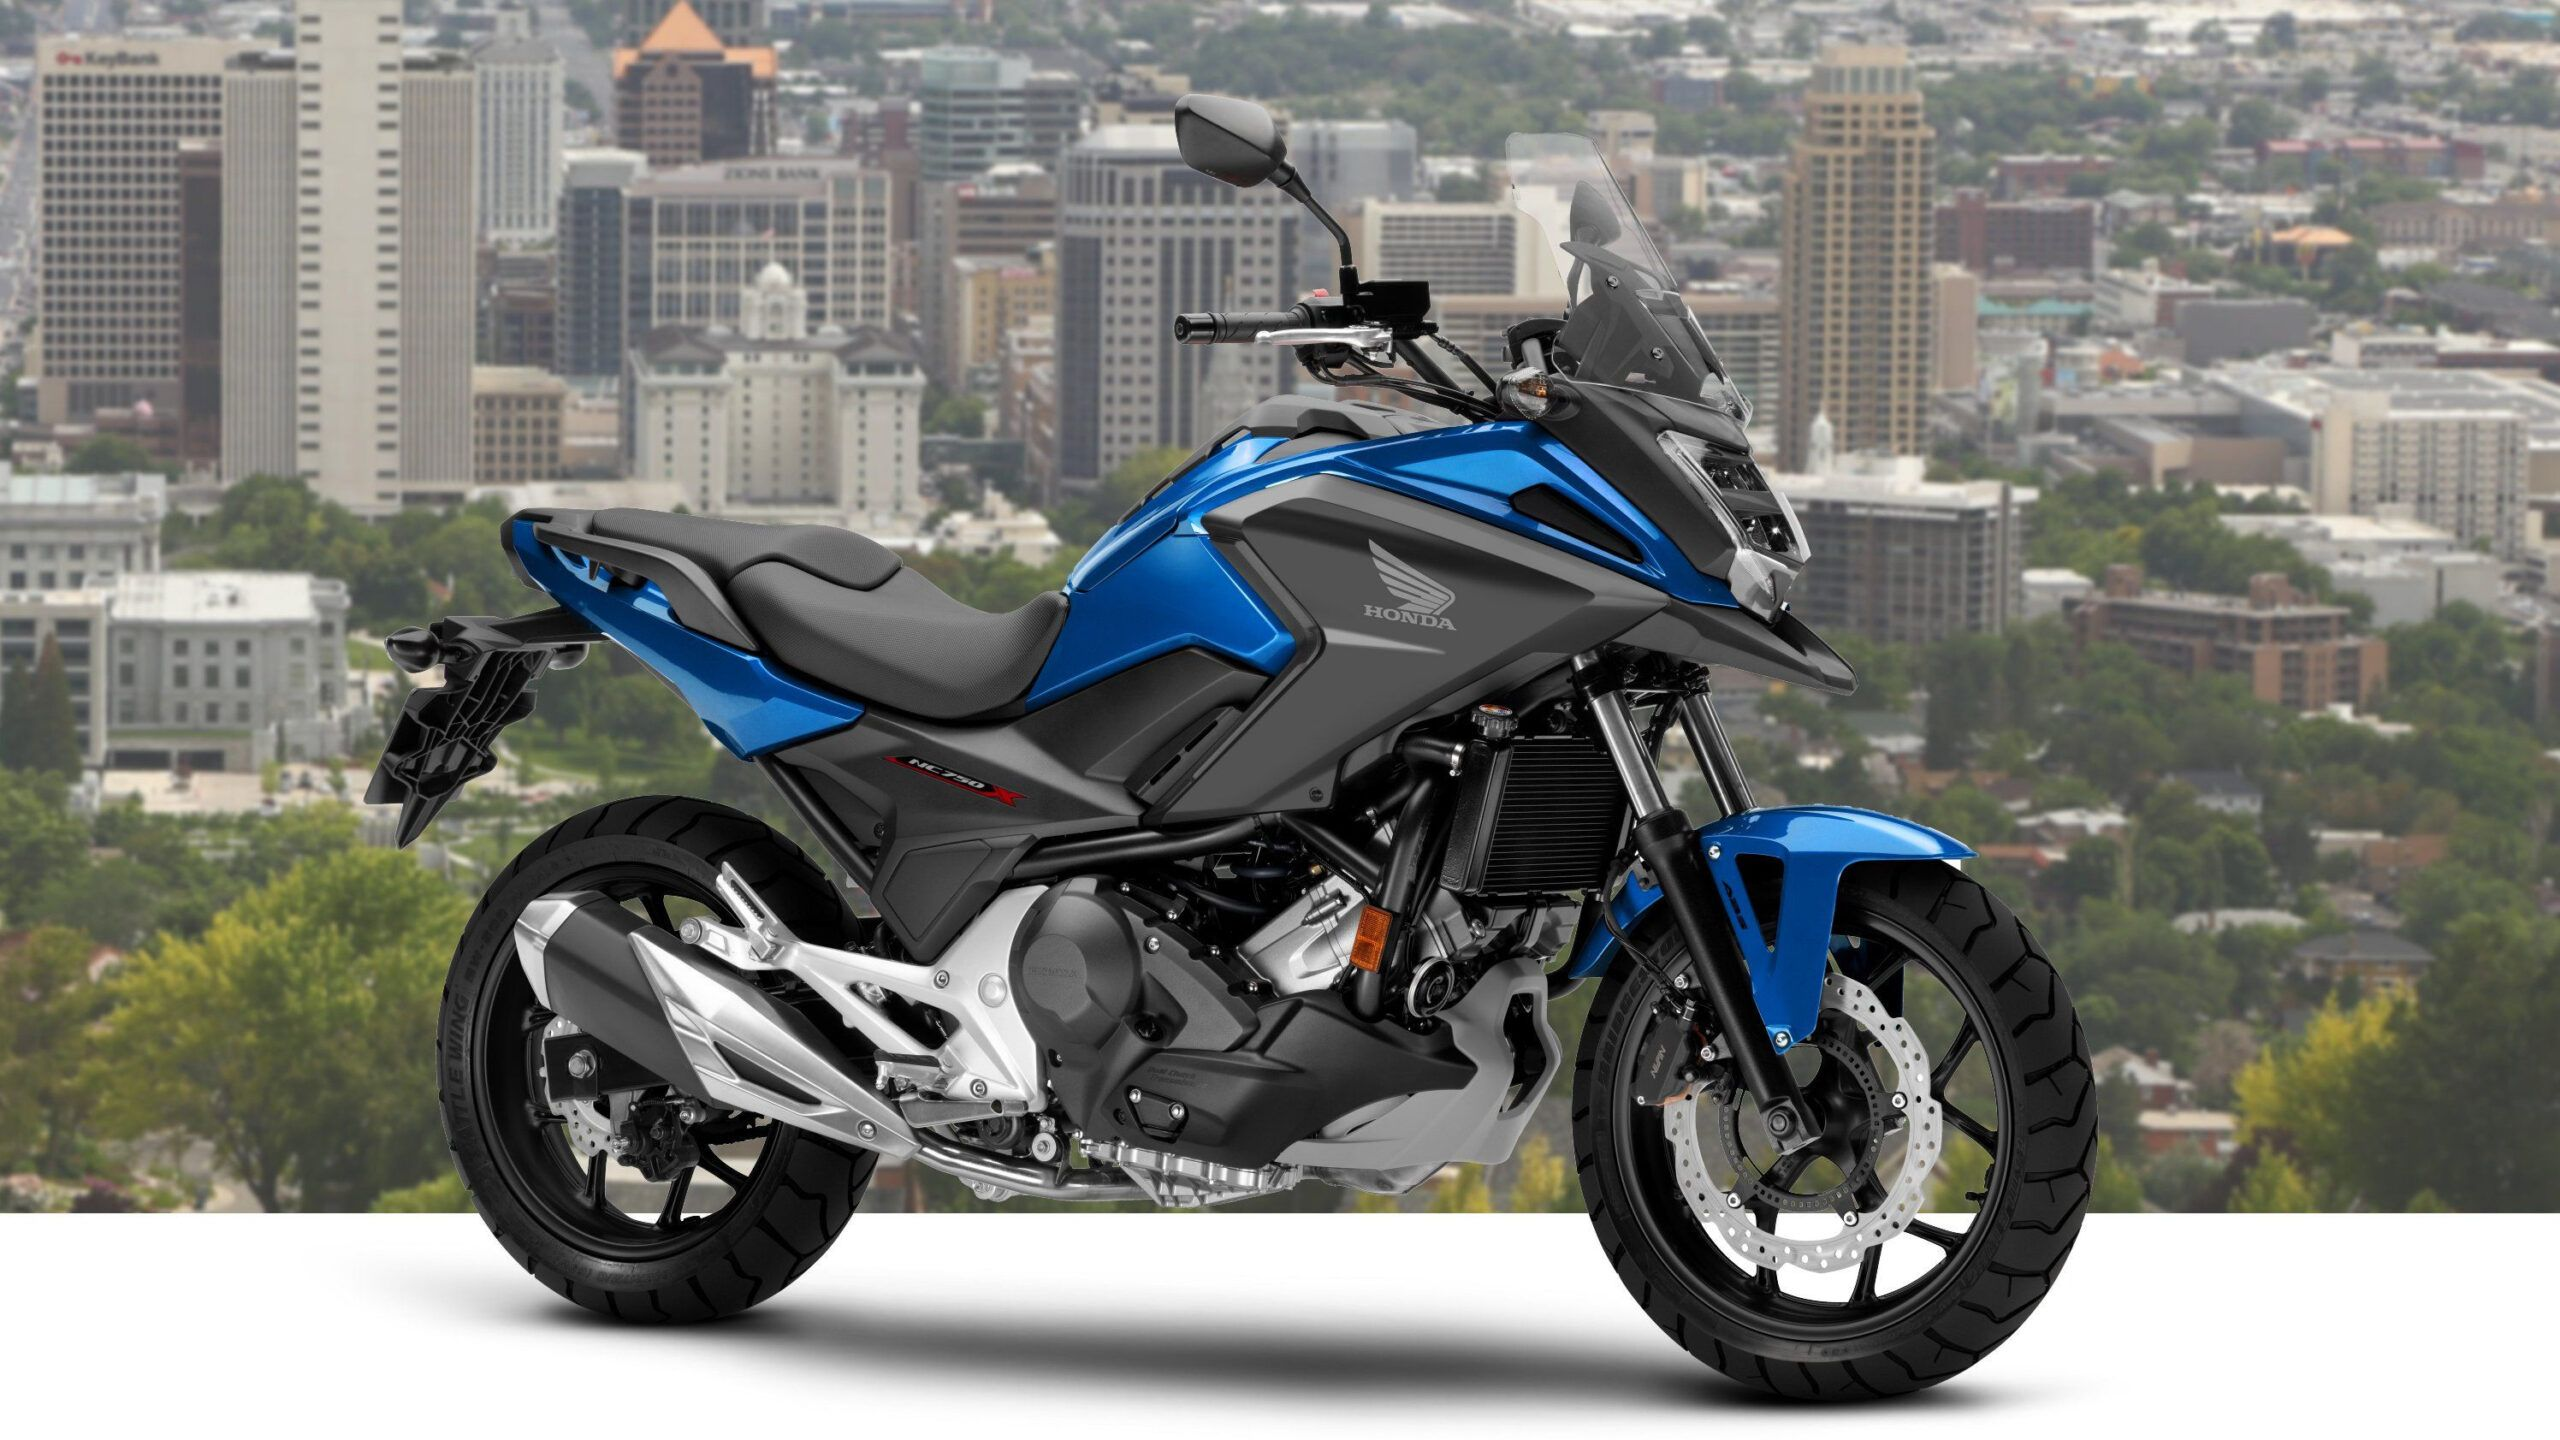 2020 Honda Nc750x Price And Release Date In 2020 Motorrad